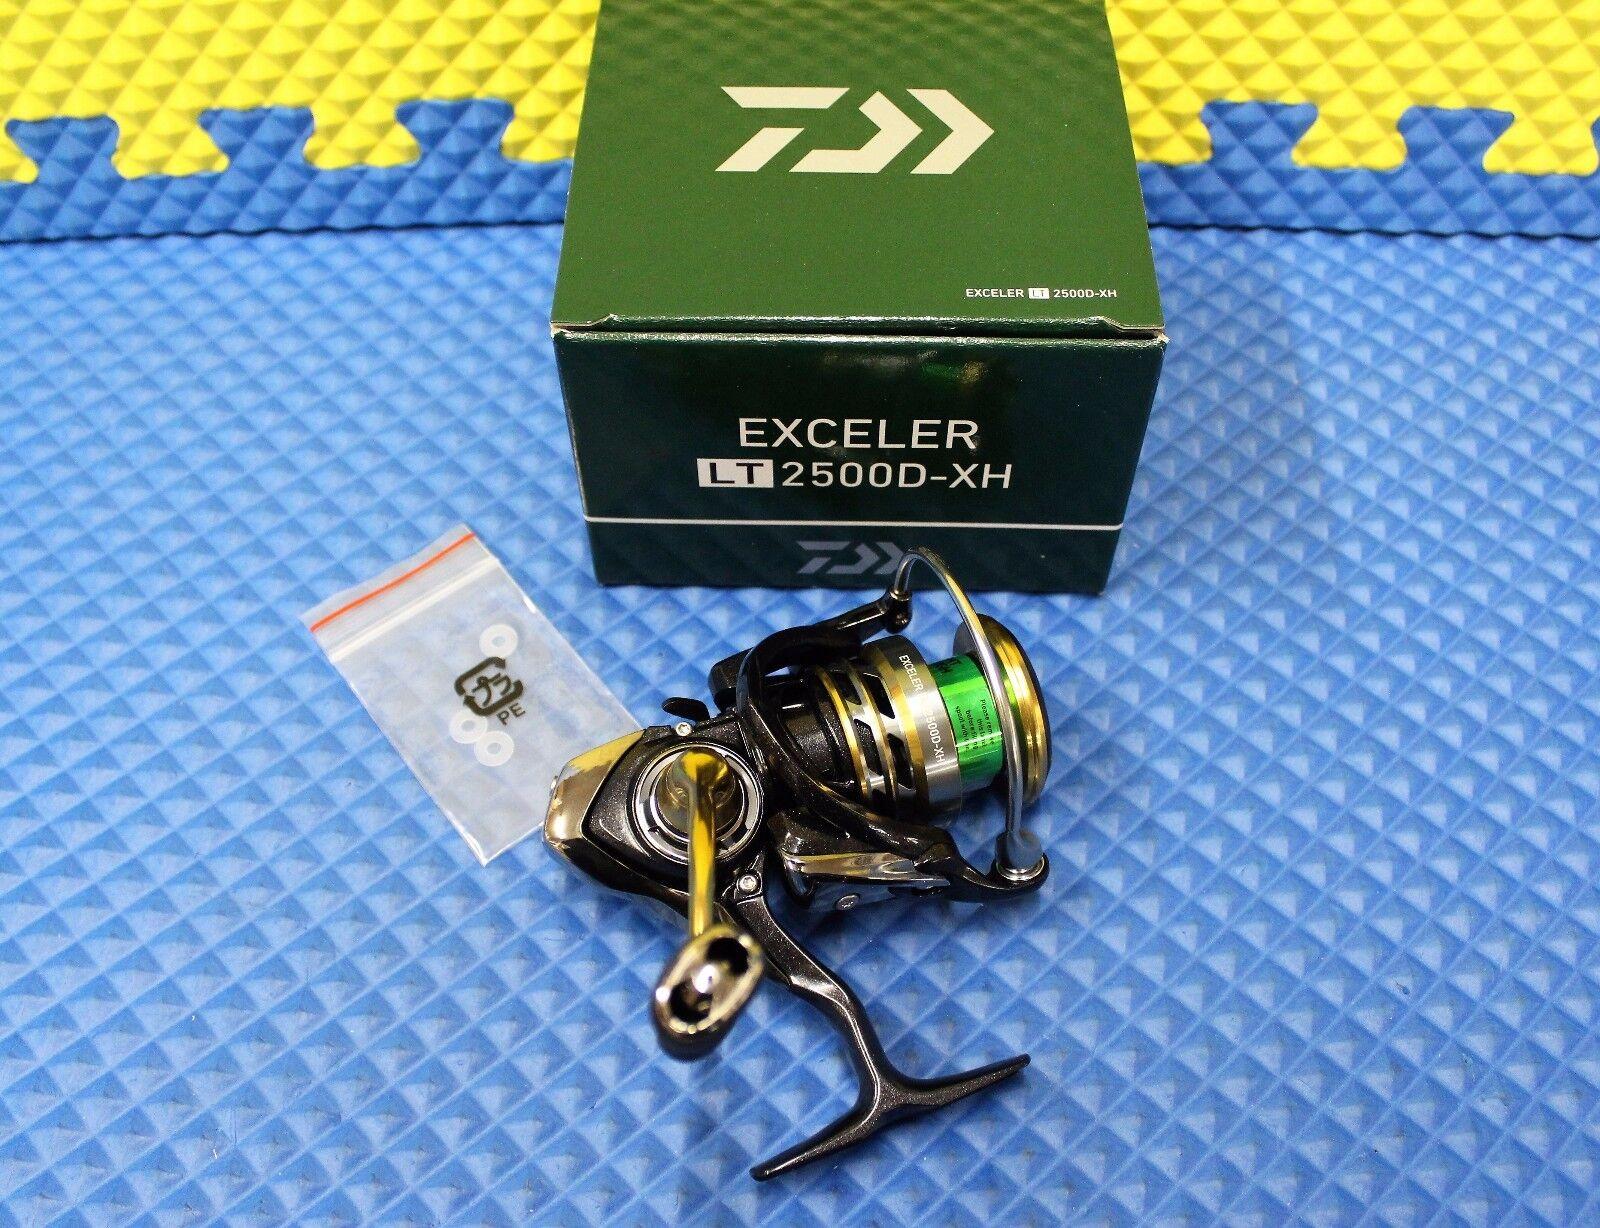 Daiwa Exceler Spinning Reel EXLT2500D-XH